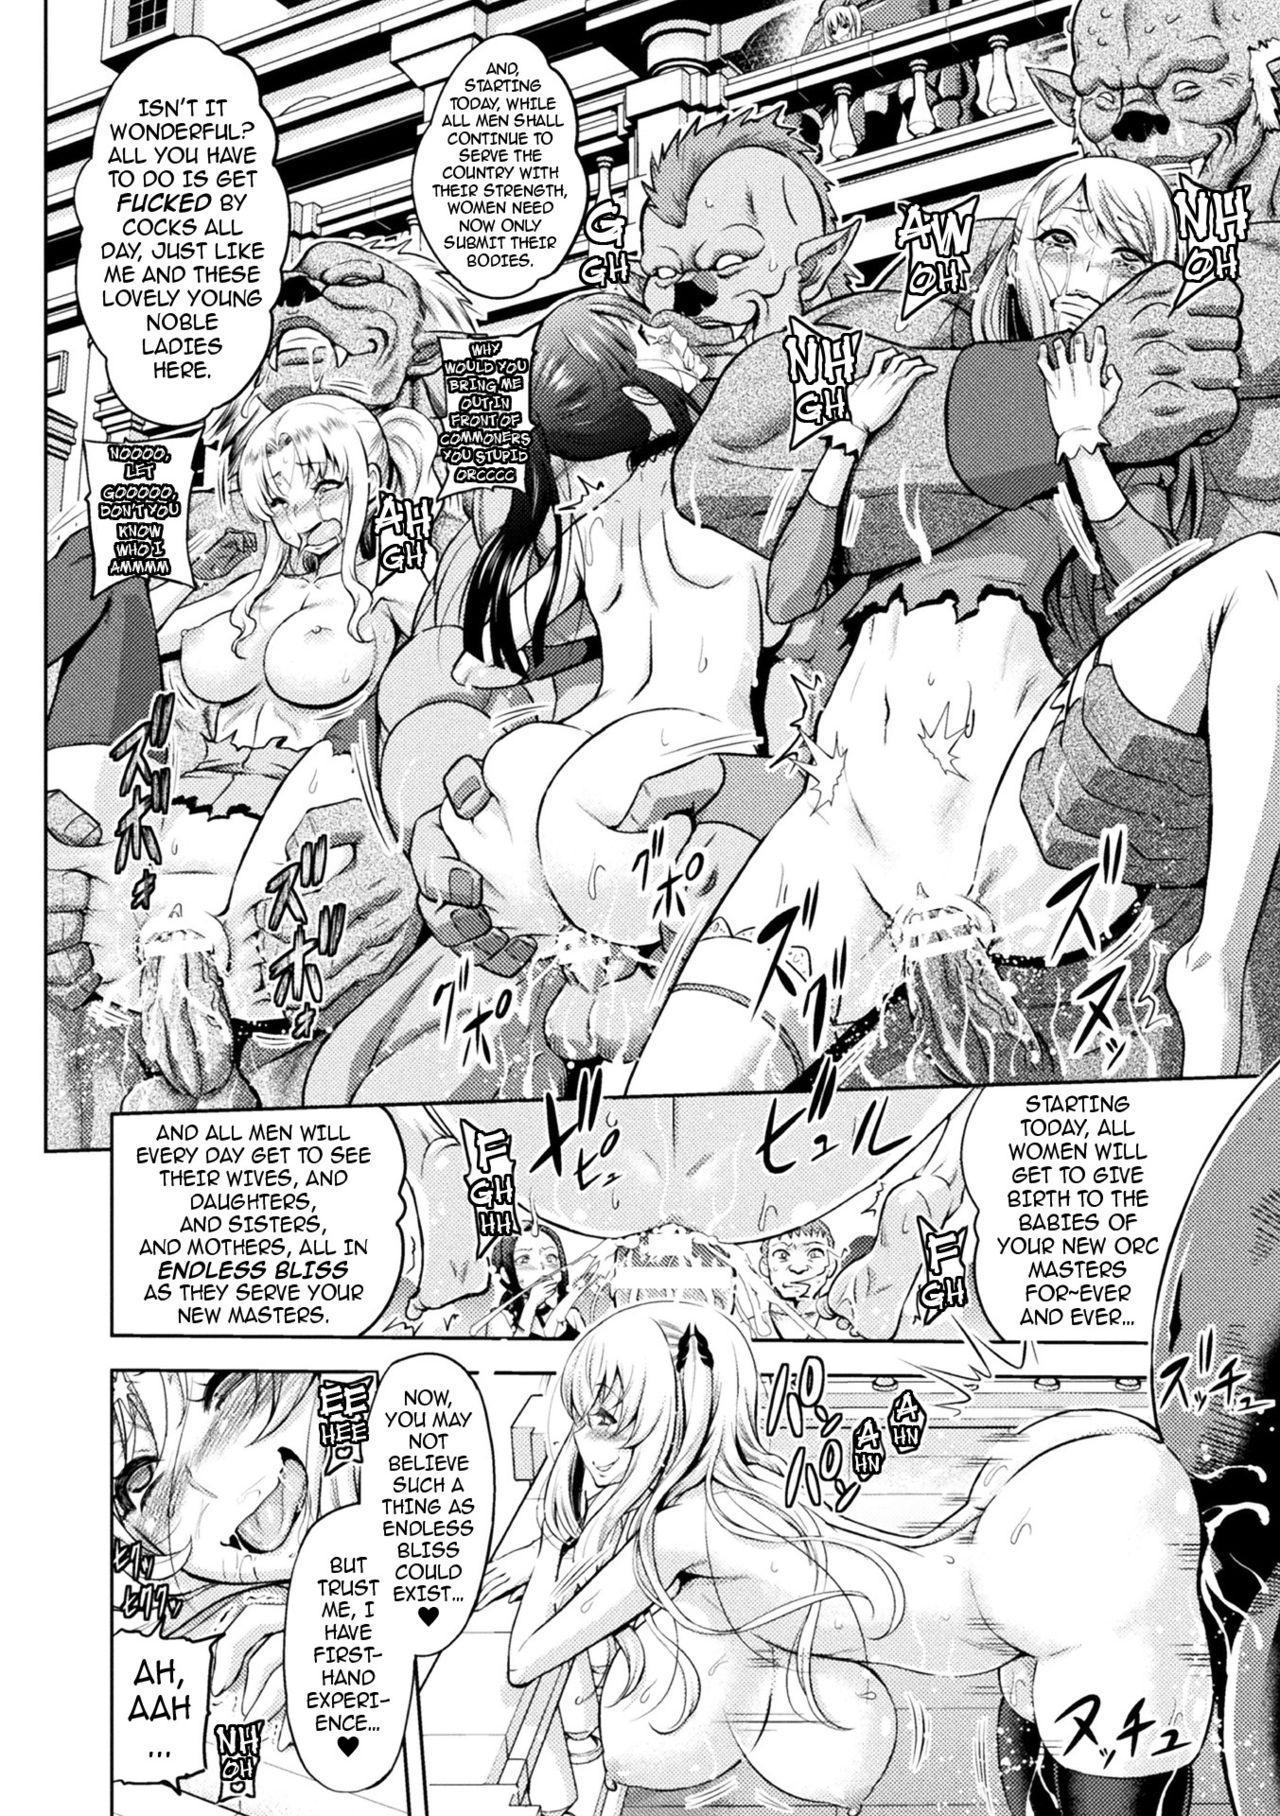 [Yamada Gogogo] Erona ~Orc no Inmon ni Okasareta Onna Kishi no Matsuro~ | Erona ~The Fall of a Beautiful Knight Cursed with the Lewd Mark of an Orc~ Ch. 1-5 [English] {darknight} 102